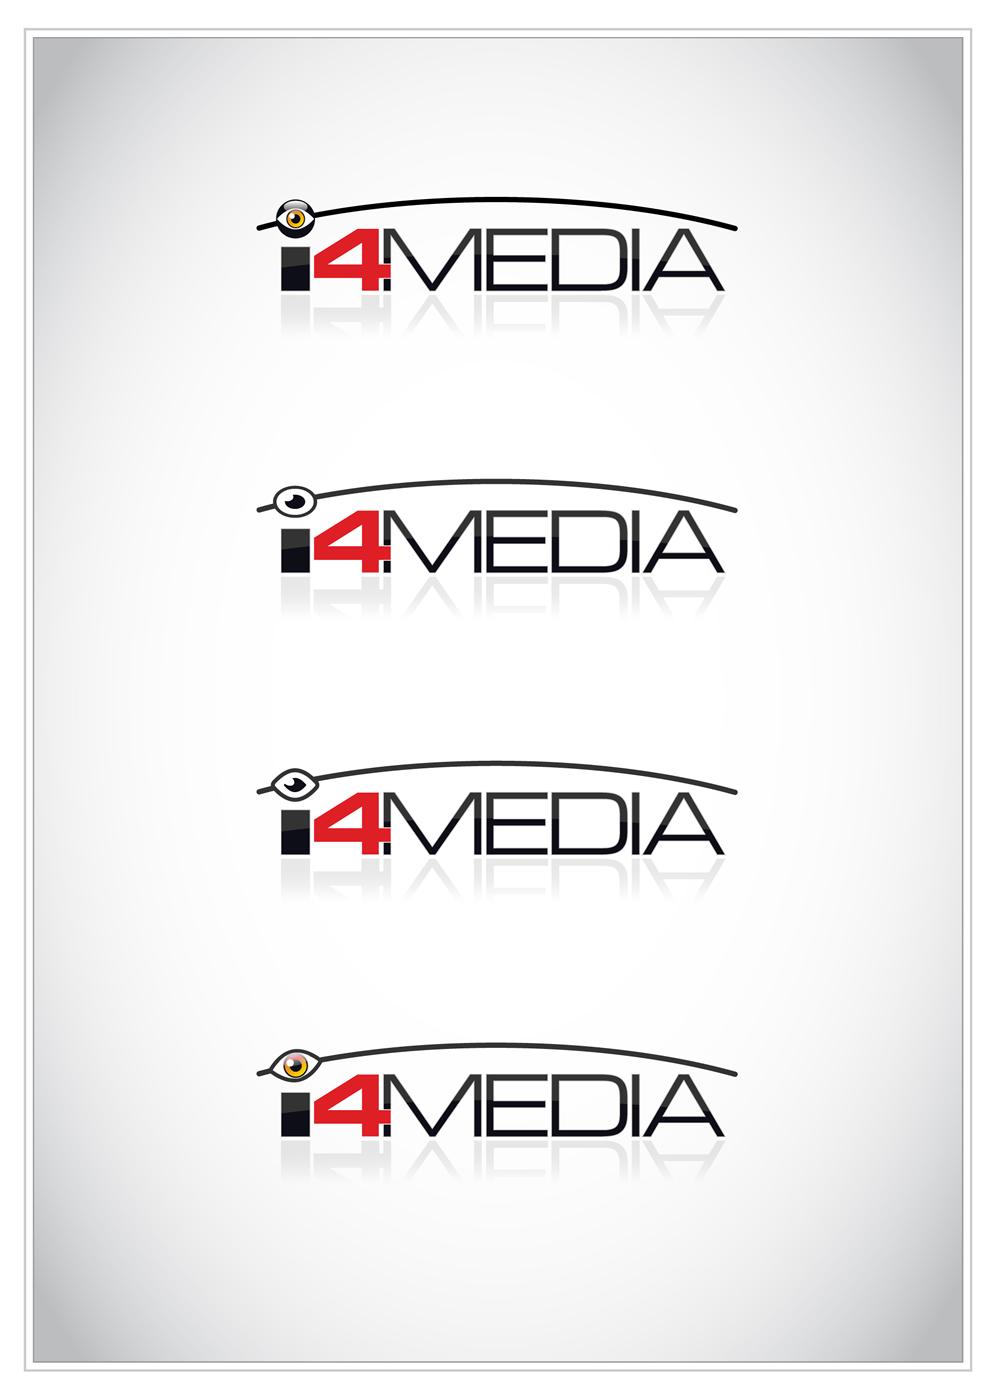 Logo Design job – i4media online logo design for our business needed – Winning design by xenowebdev